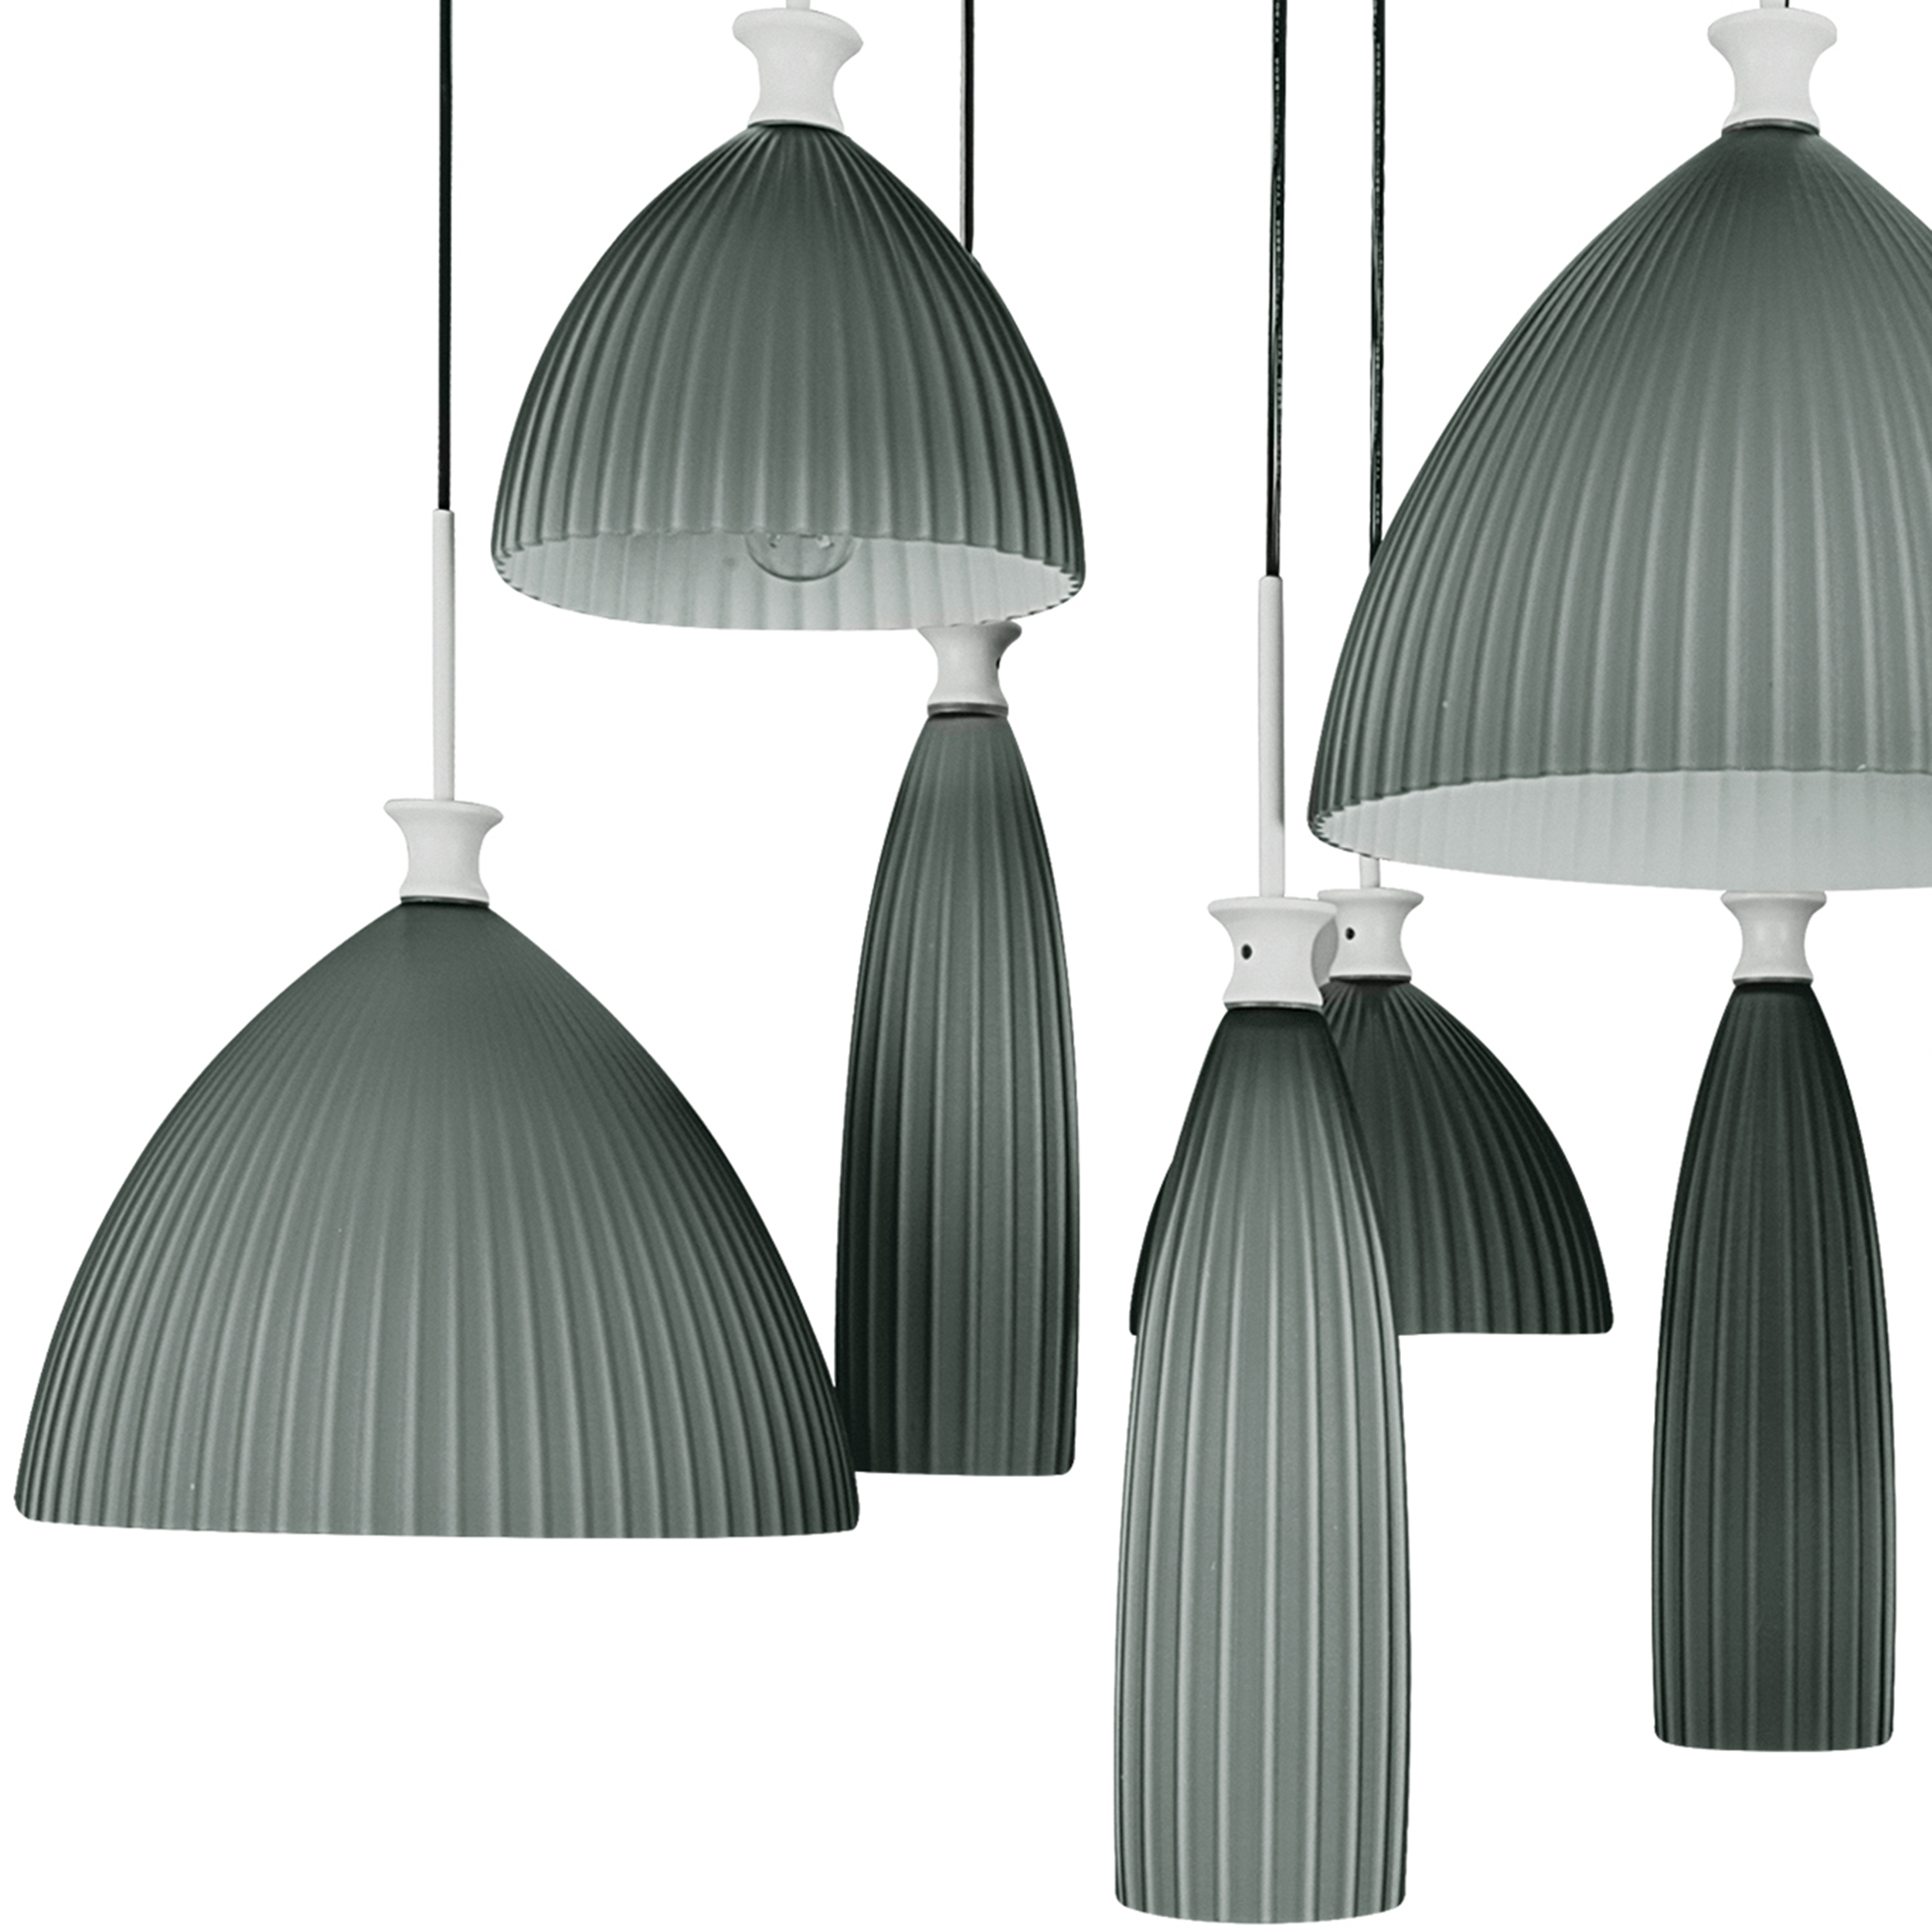 Люстра-каскад Lightstar Agola 810221, 12xE14x40W, хром, серый, металл, стекло - фото 2